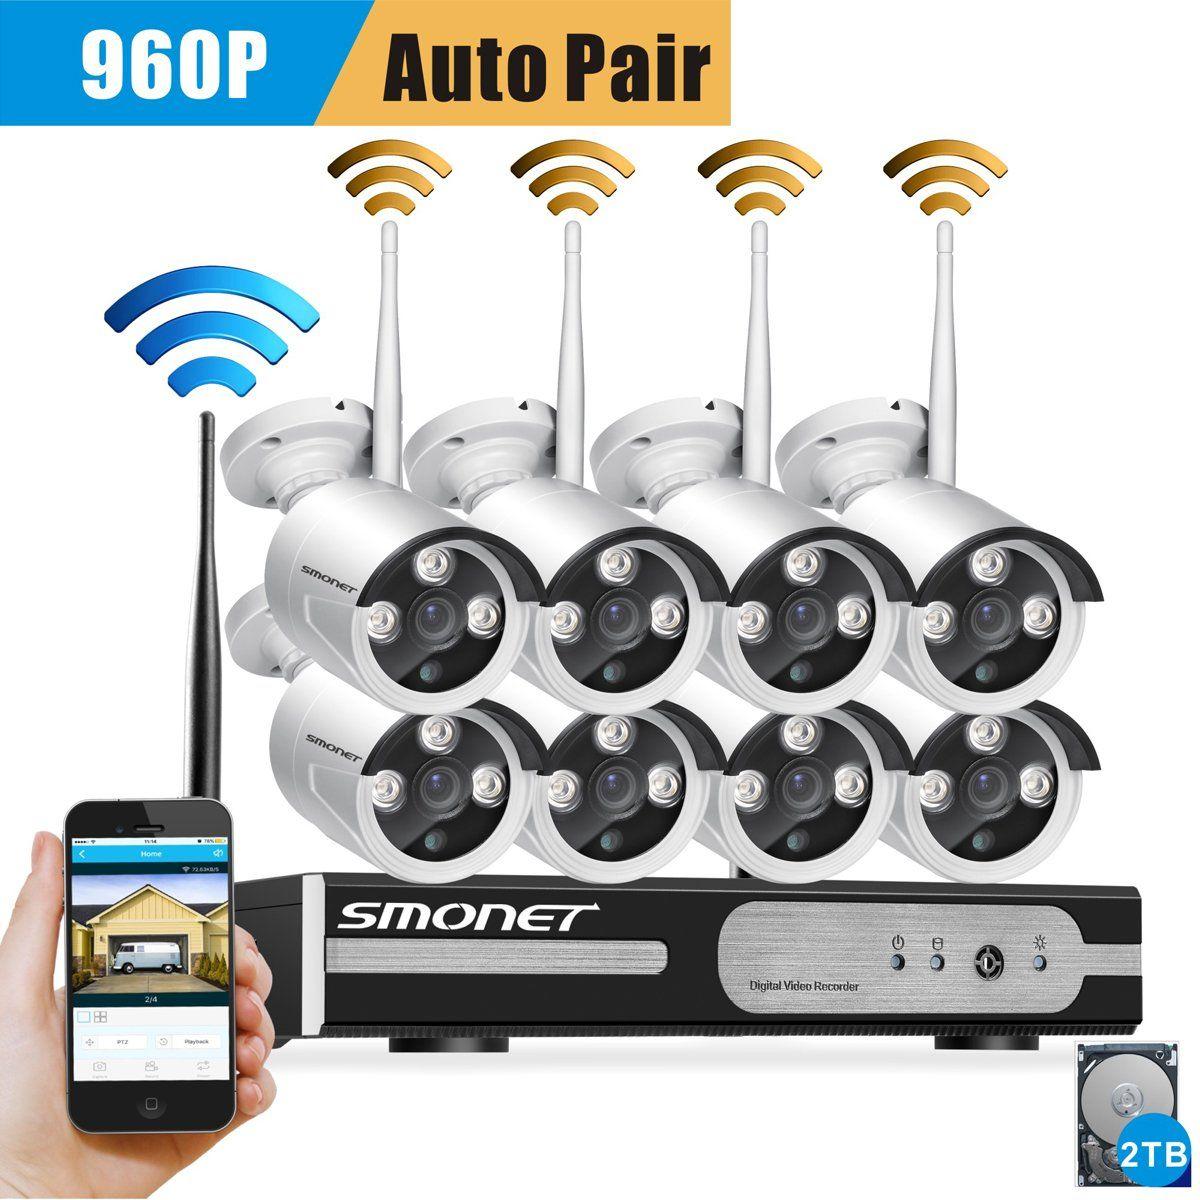 Smonet 8ch 960p Hd Wireless Network Ip Security Camera System Wifi Nvr Kit Wireless Surveillance Camera Outdoor Security Camera Wireless Security Camera System